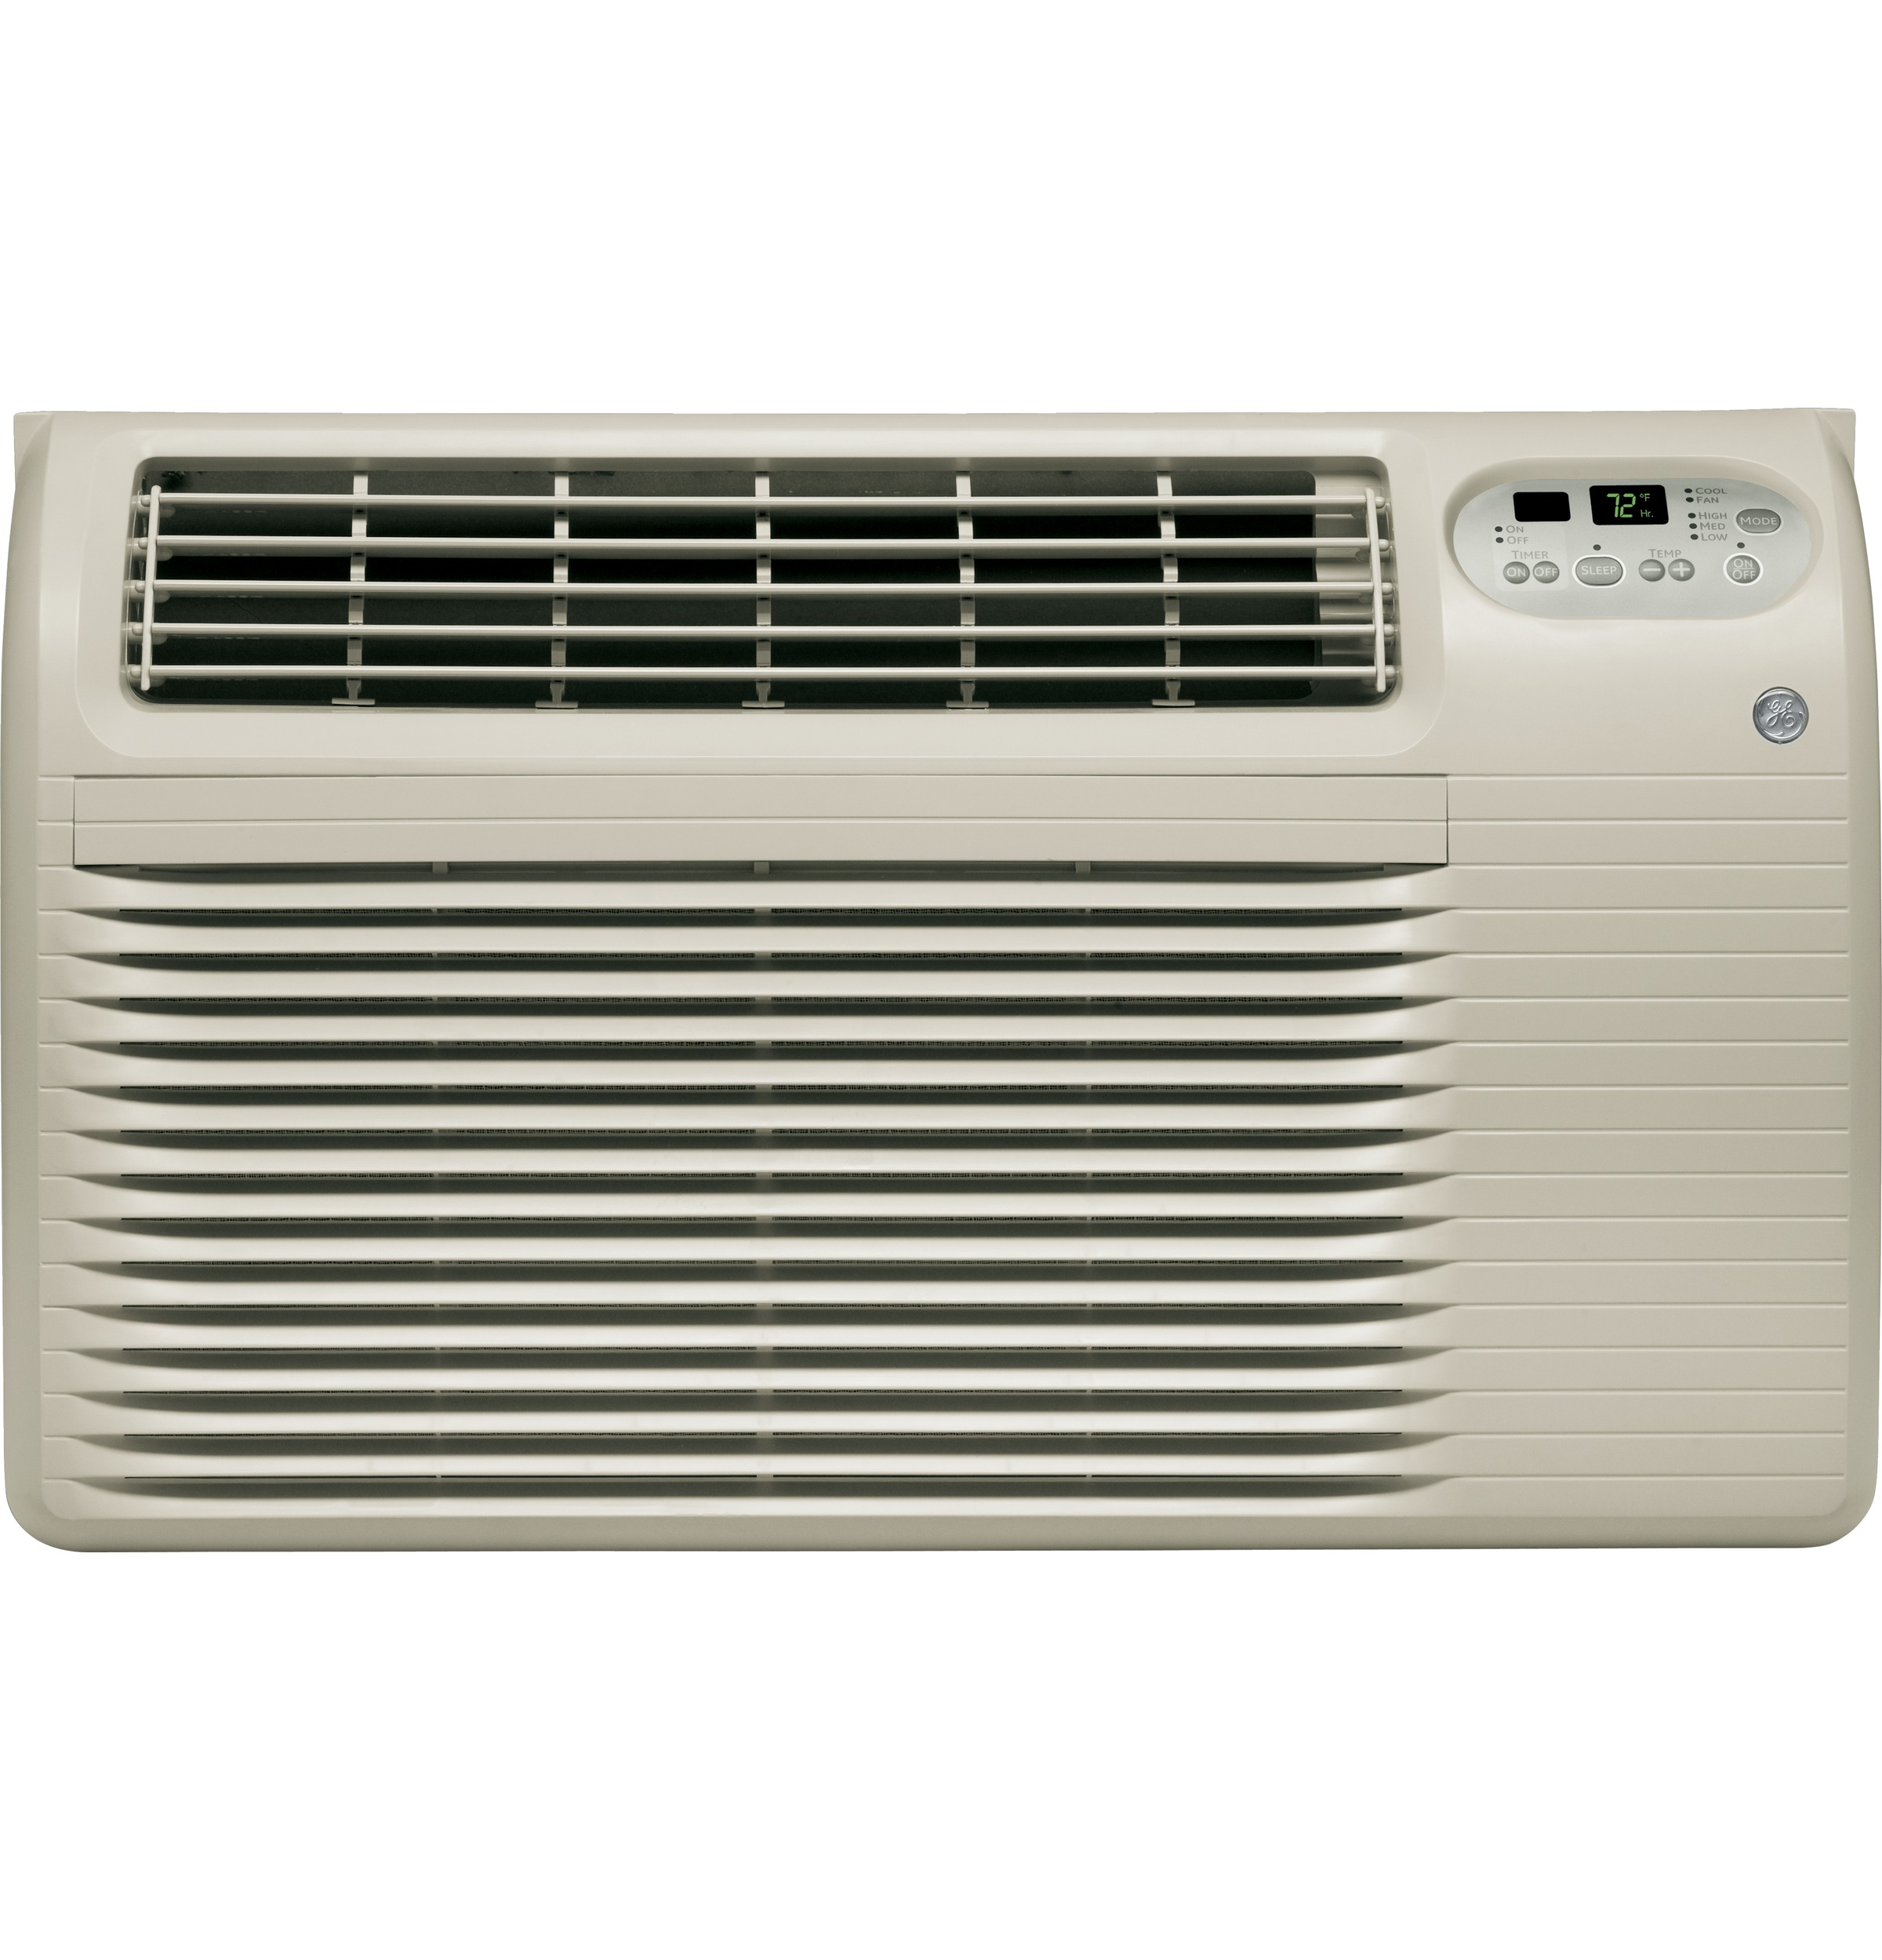 Brand: GE Model: AJCQ10ACE Style: 10 400 BTU Room Air Conditioner #756B56